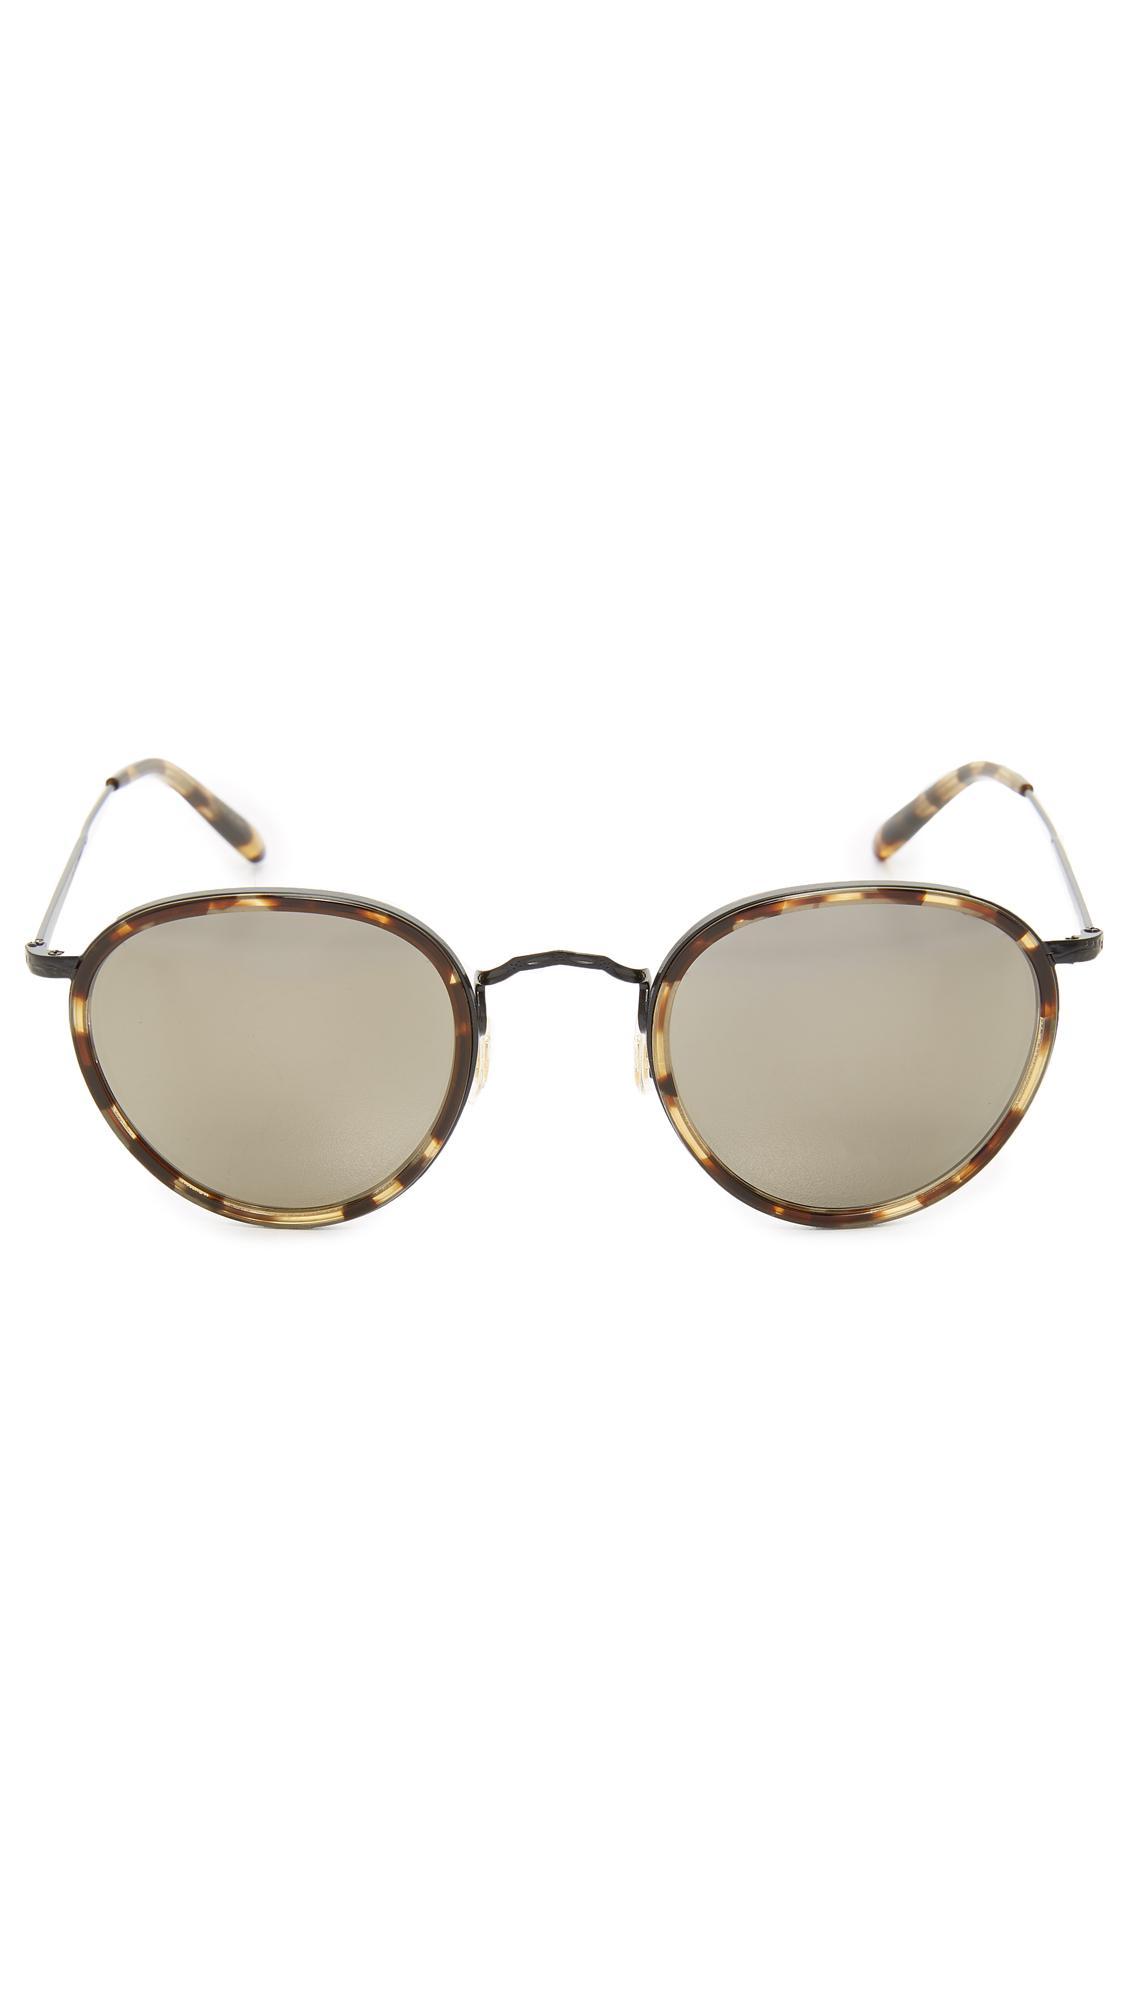 Oliver Peoples Mp-2 Sunglasses for Men